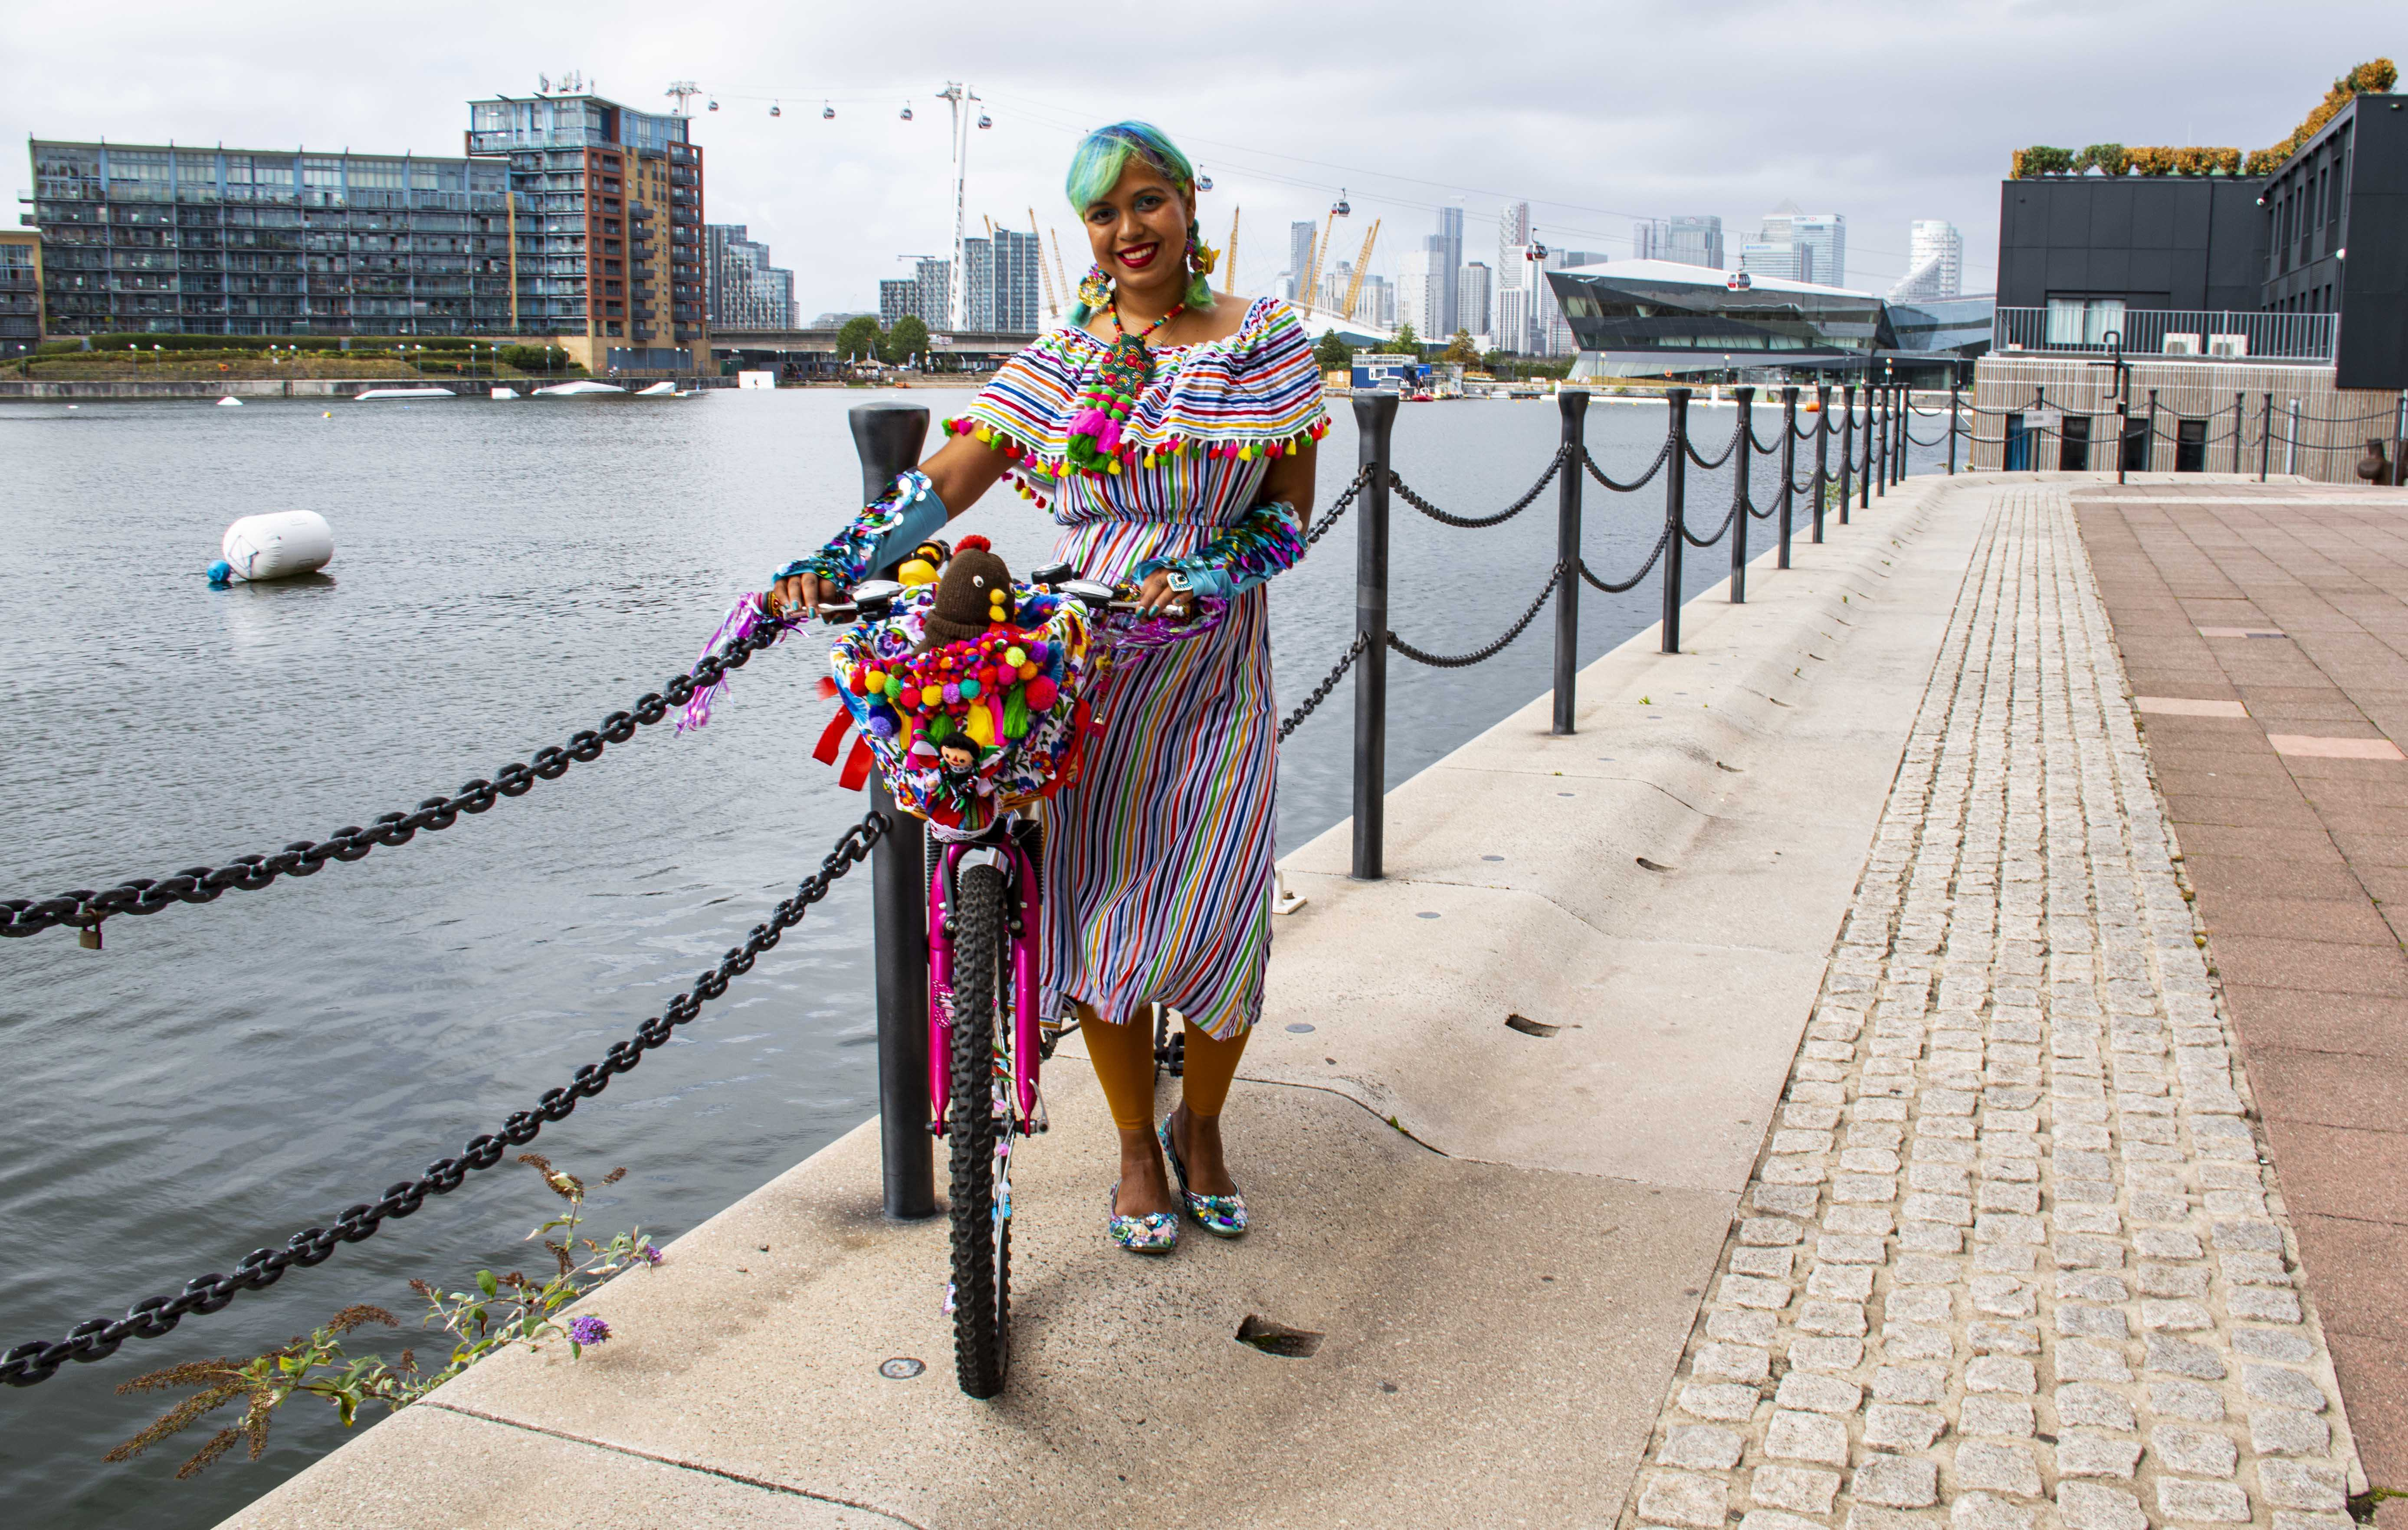 Momtaz with her bike at the Royal Docks